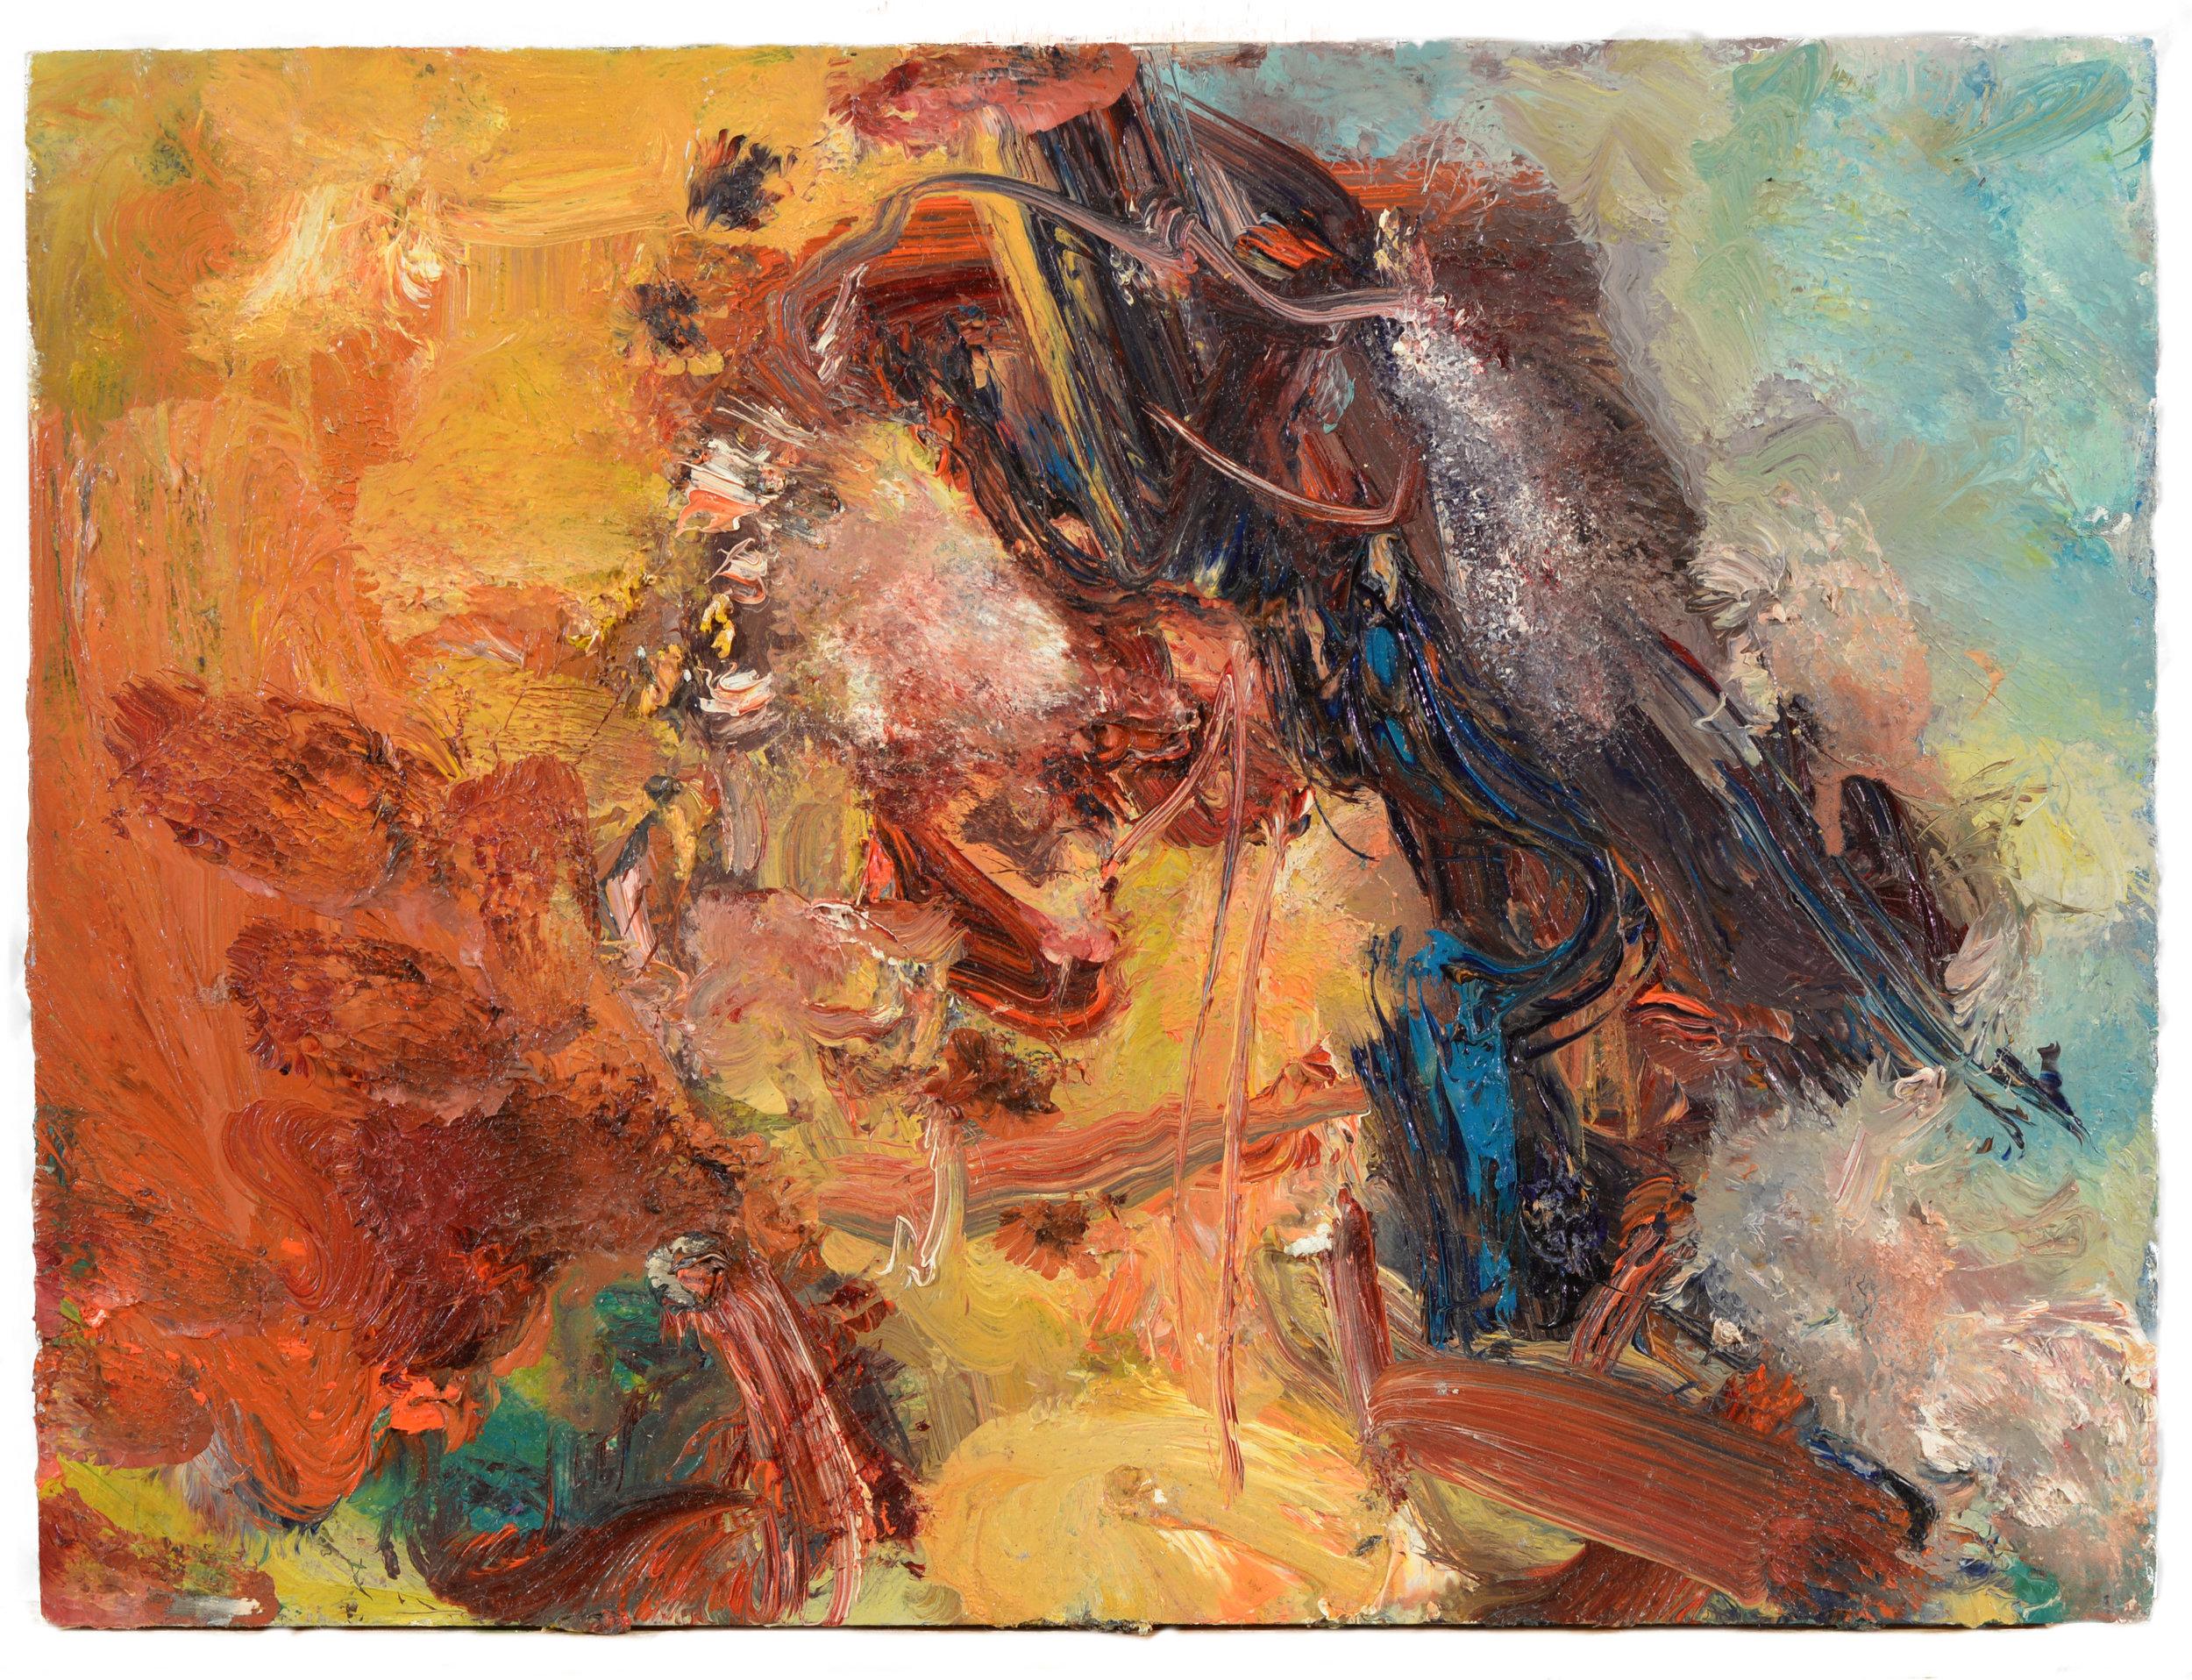 """Patricia"" oil on panel  2011  9""x12"""